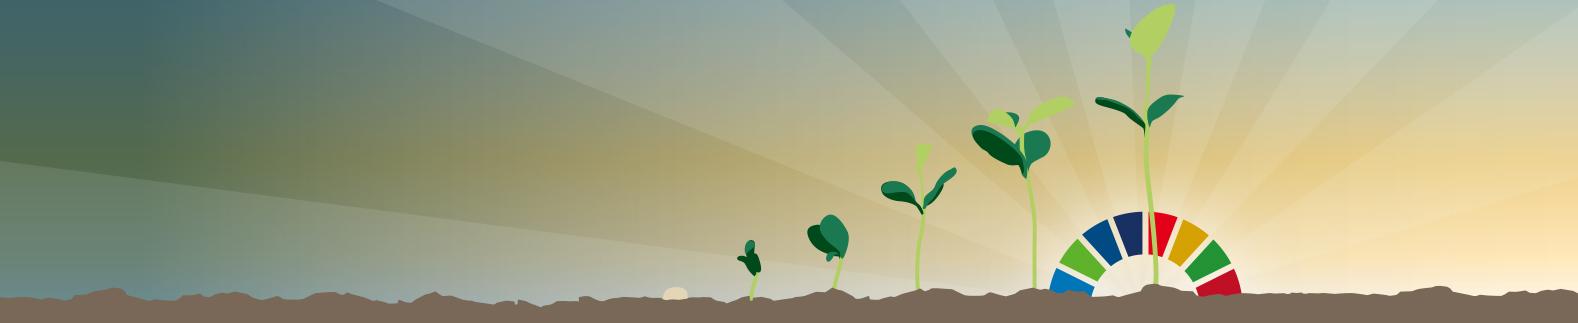 Seed Sector Declaration illustration PNG